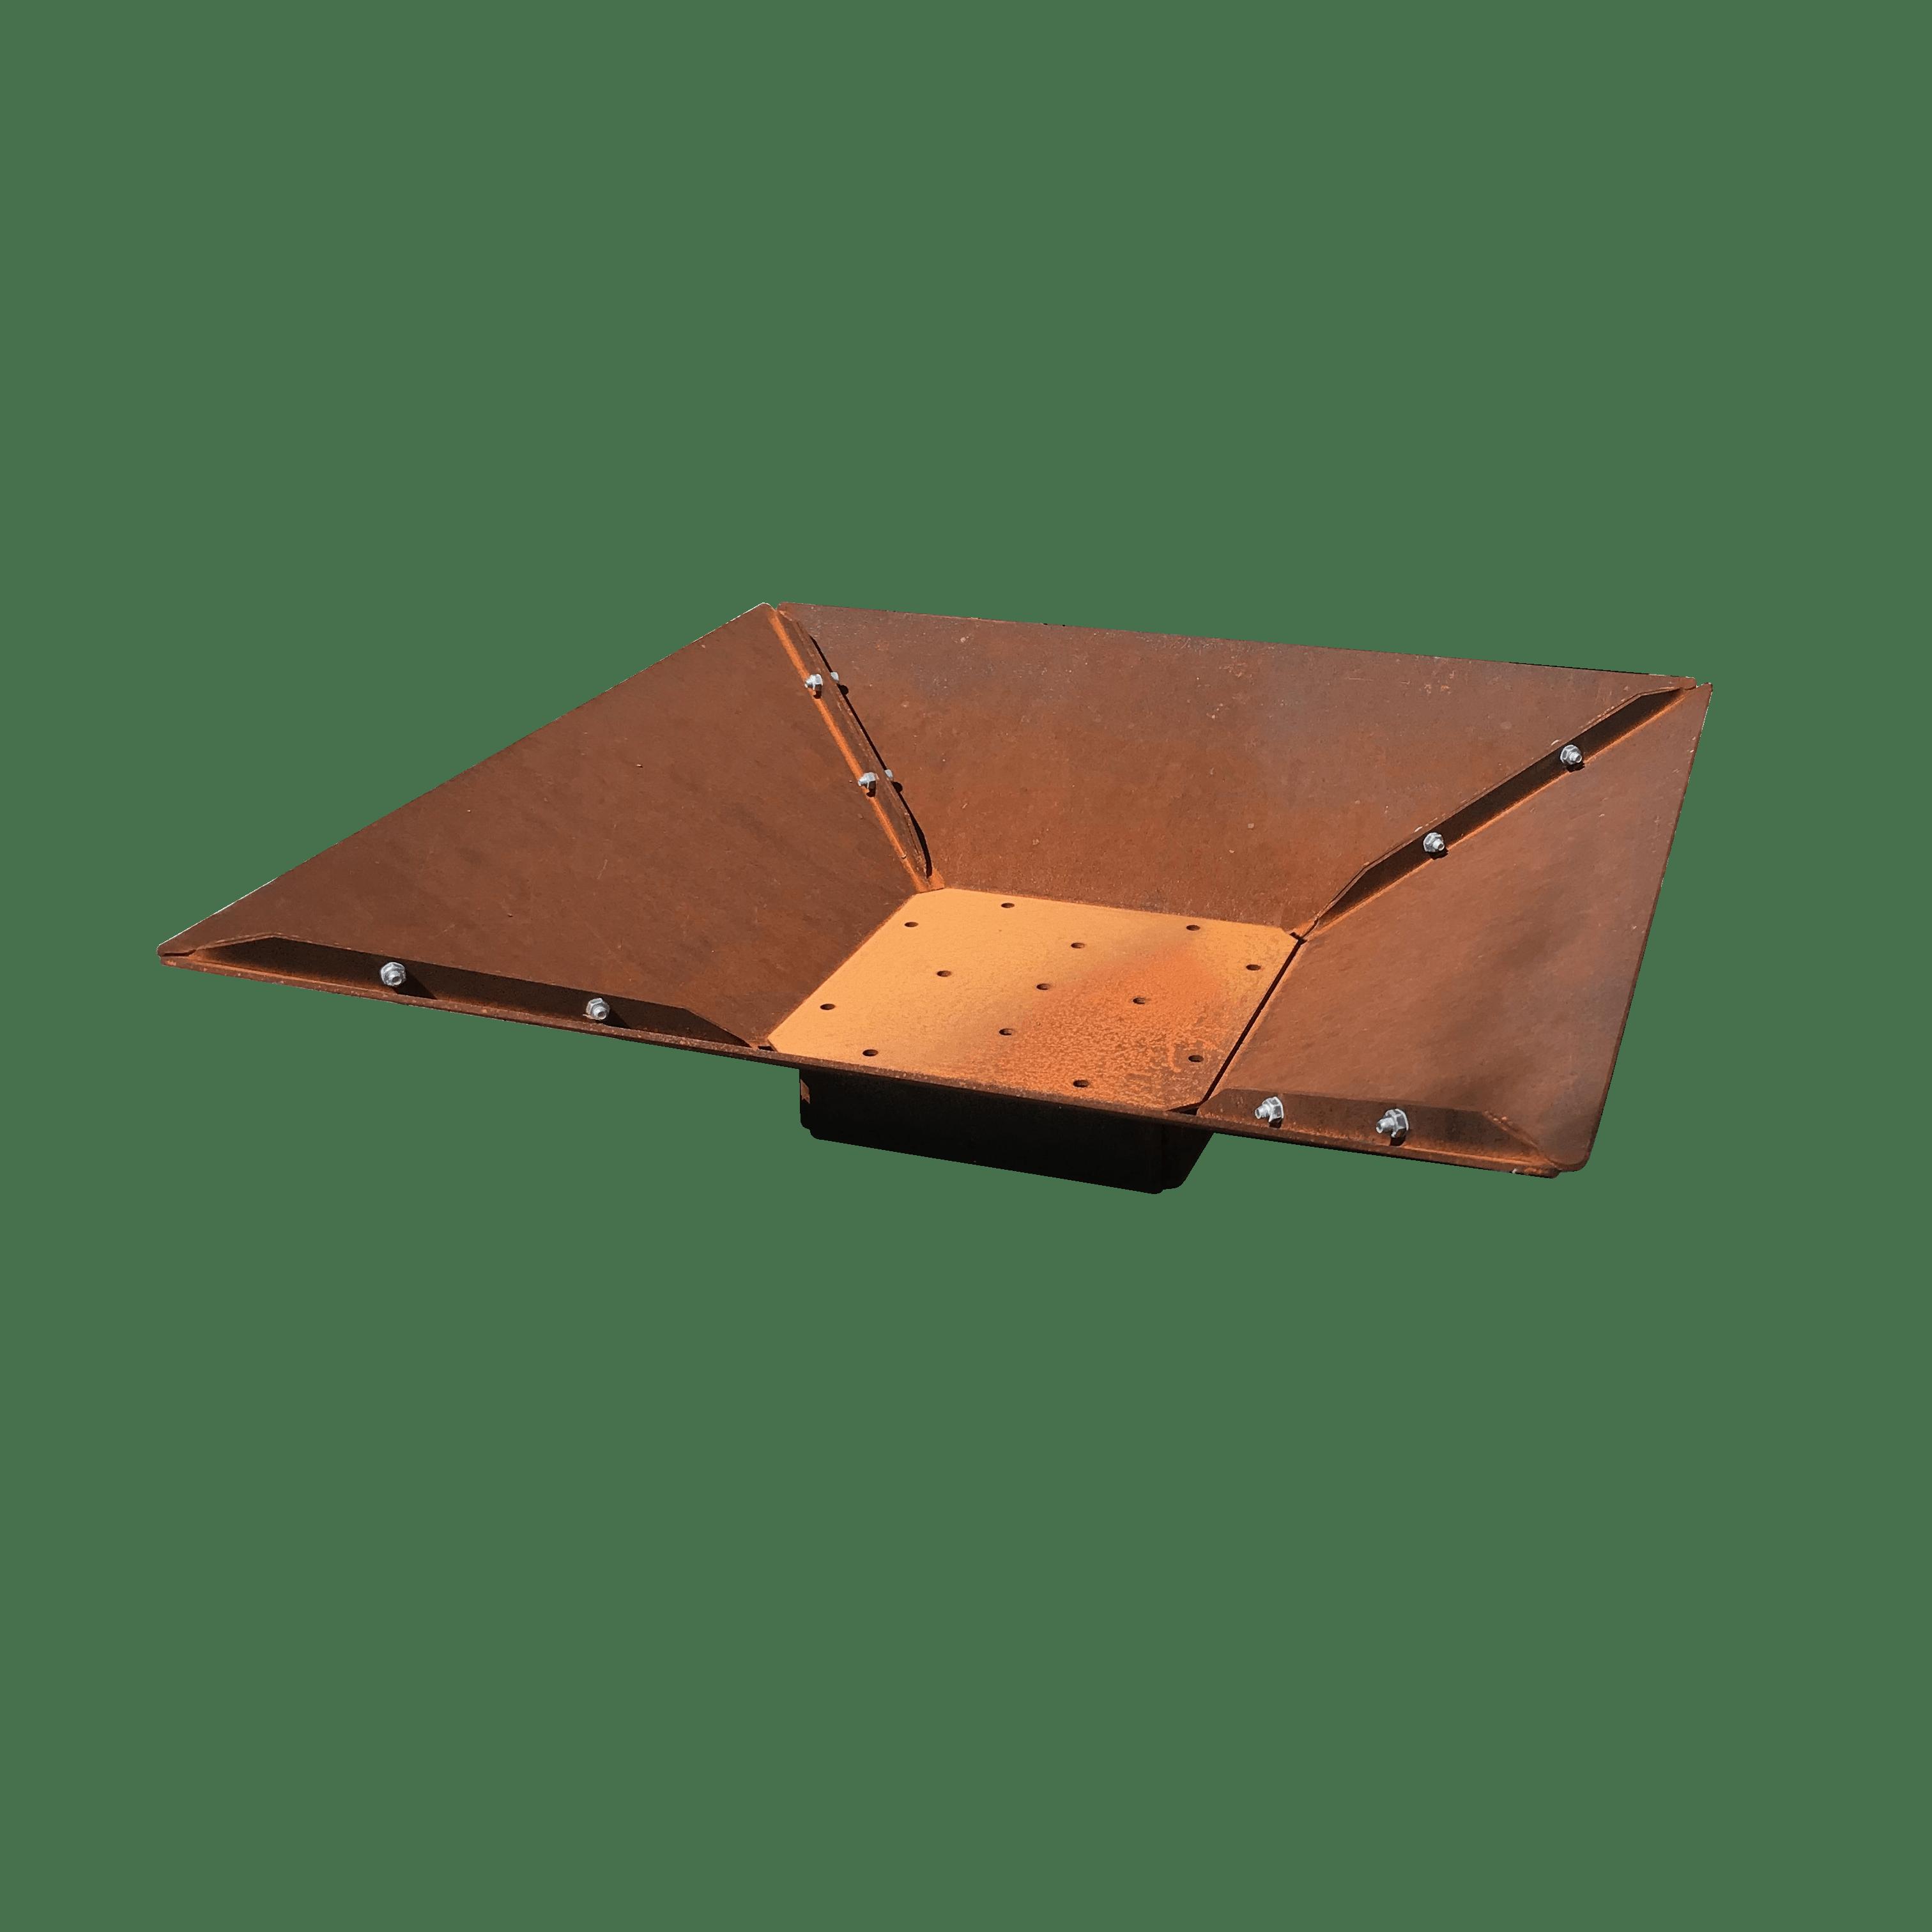 Piccolo Flat Pack FirePit